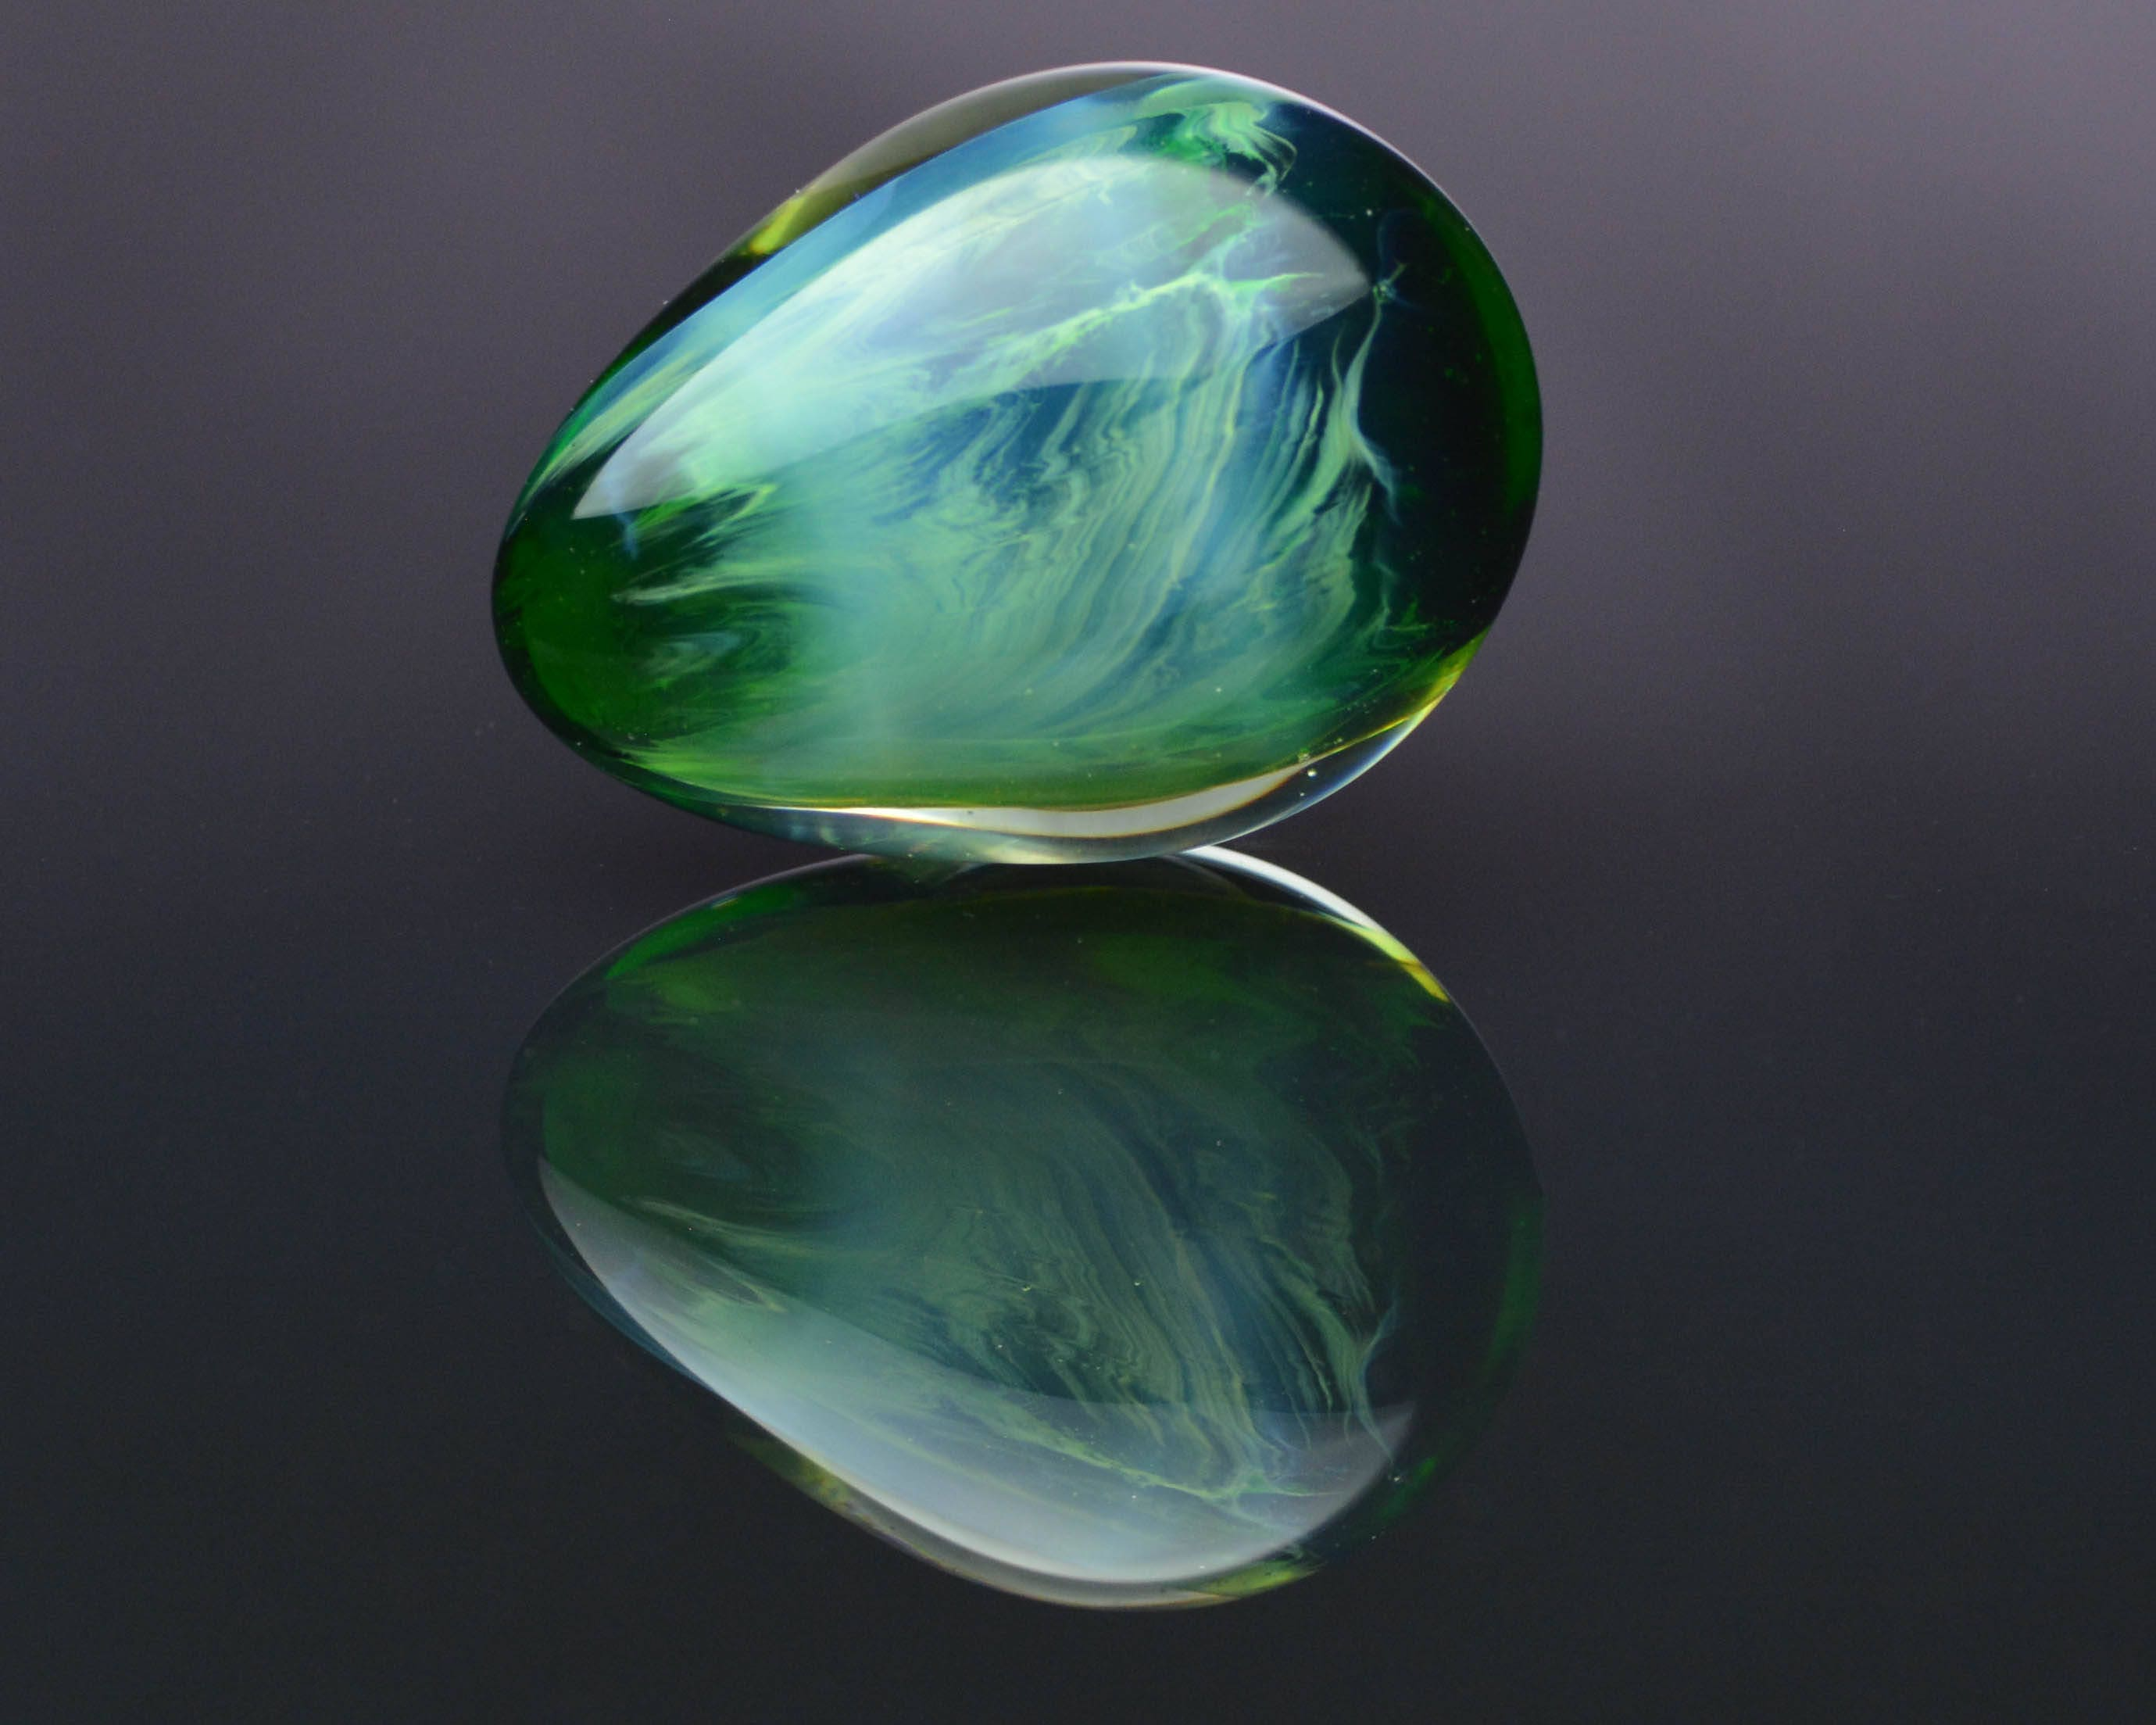 Green Glass Marble : Glass egg medium marble green